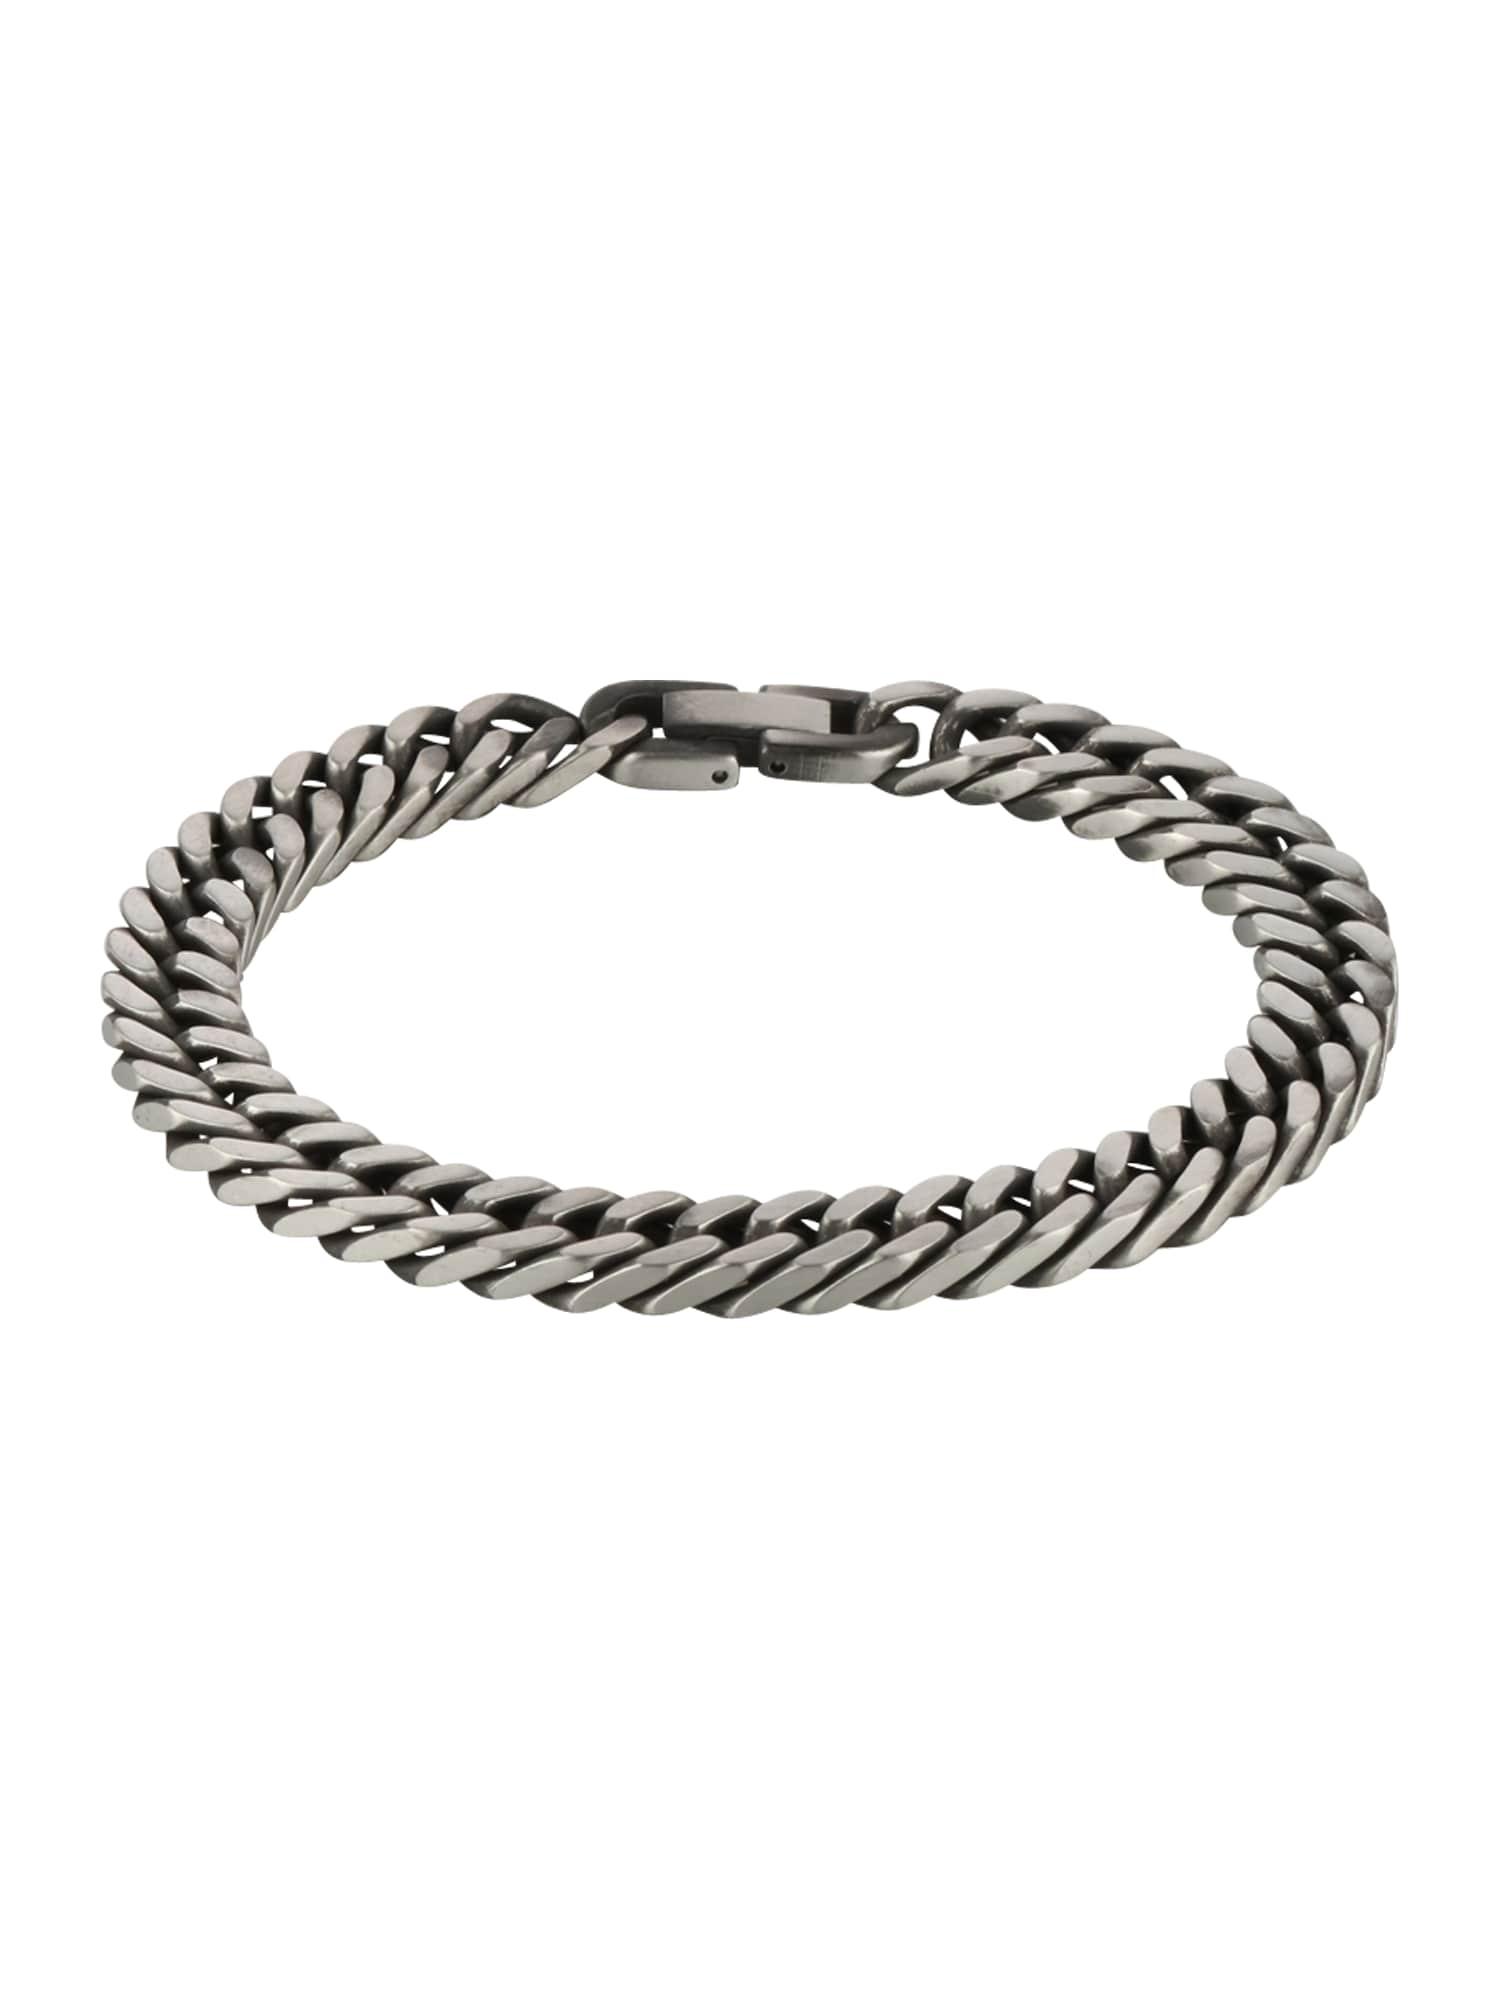 Náramek Bracelet antic silver stříbrná ROYAL-EGO